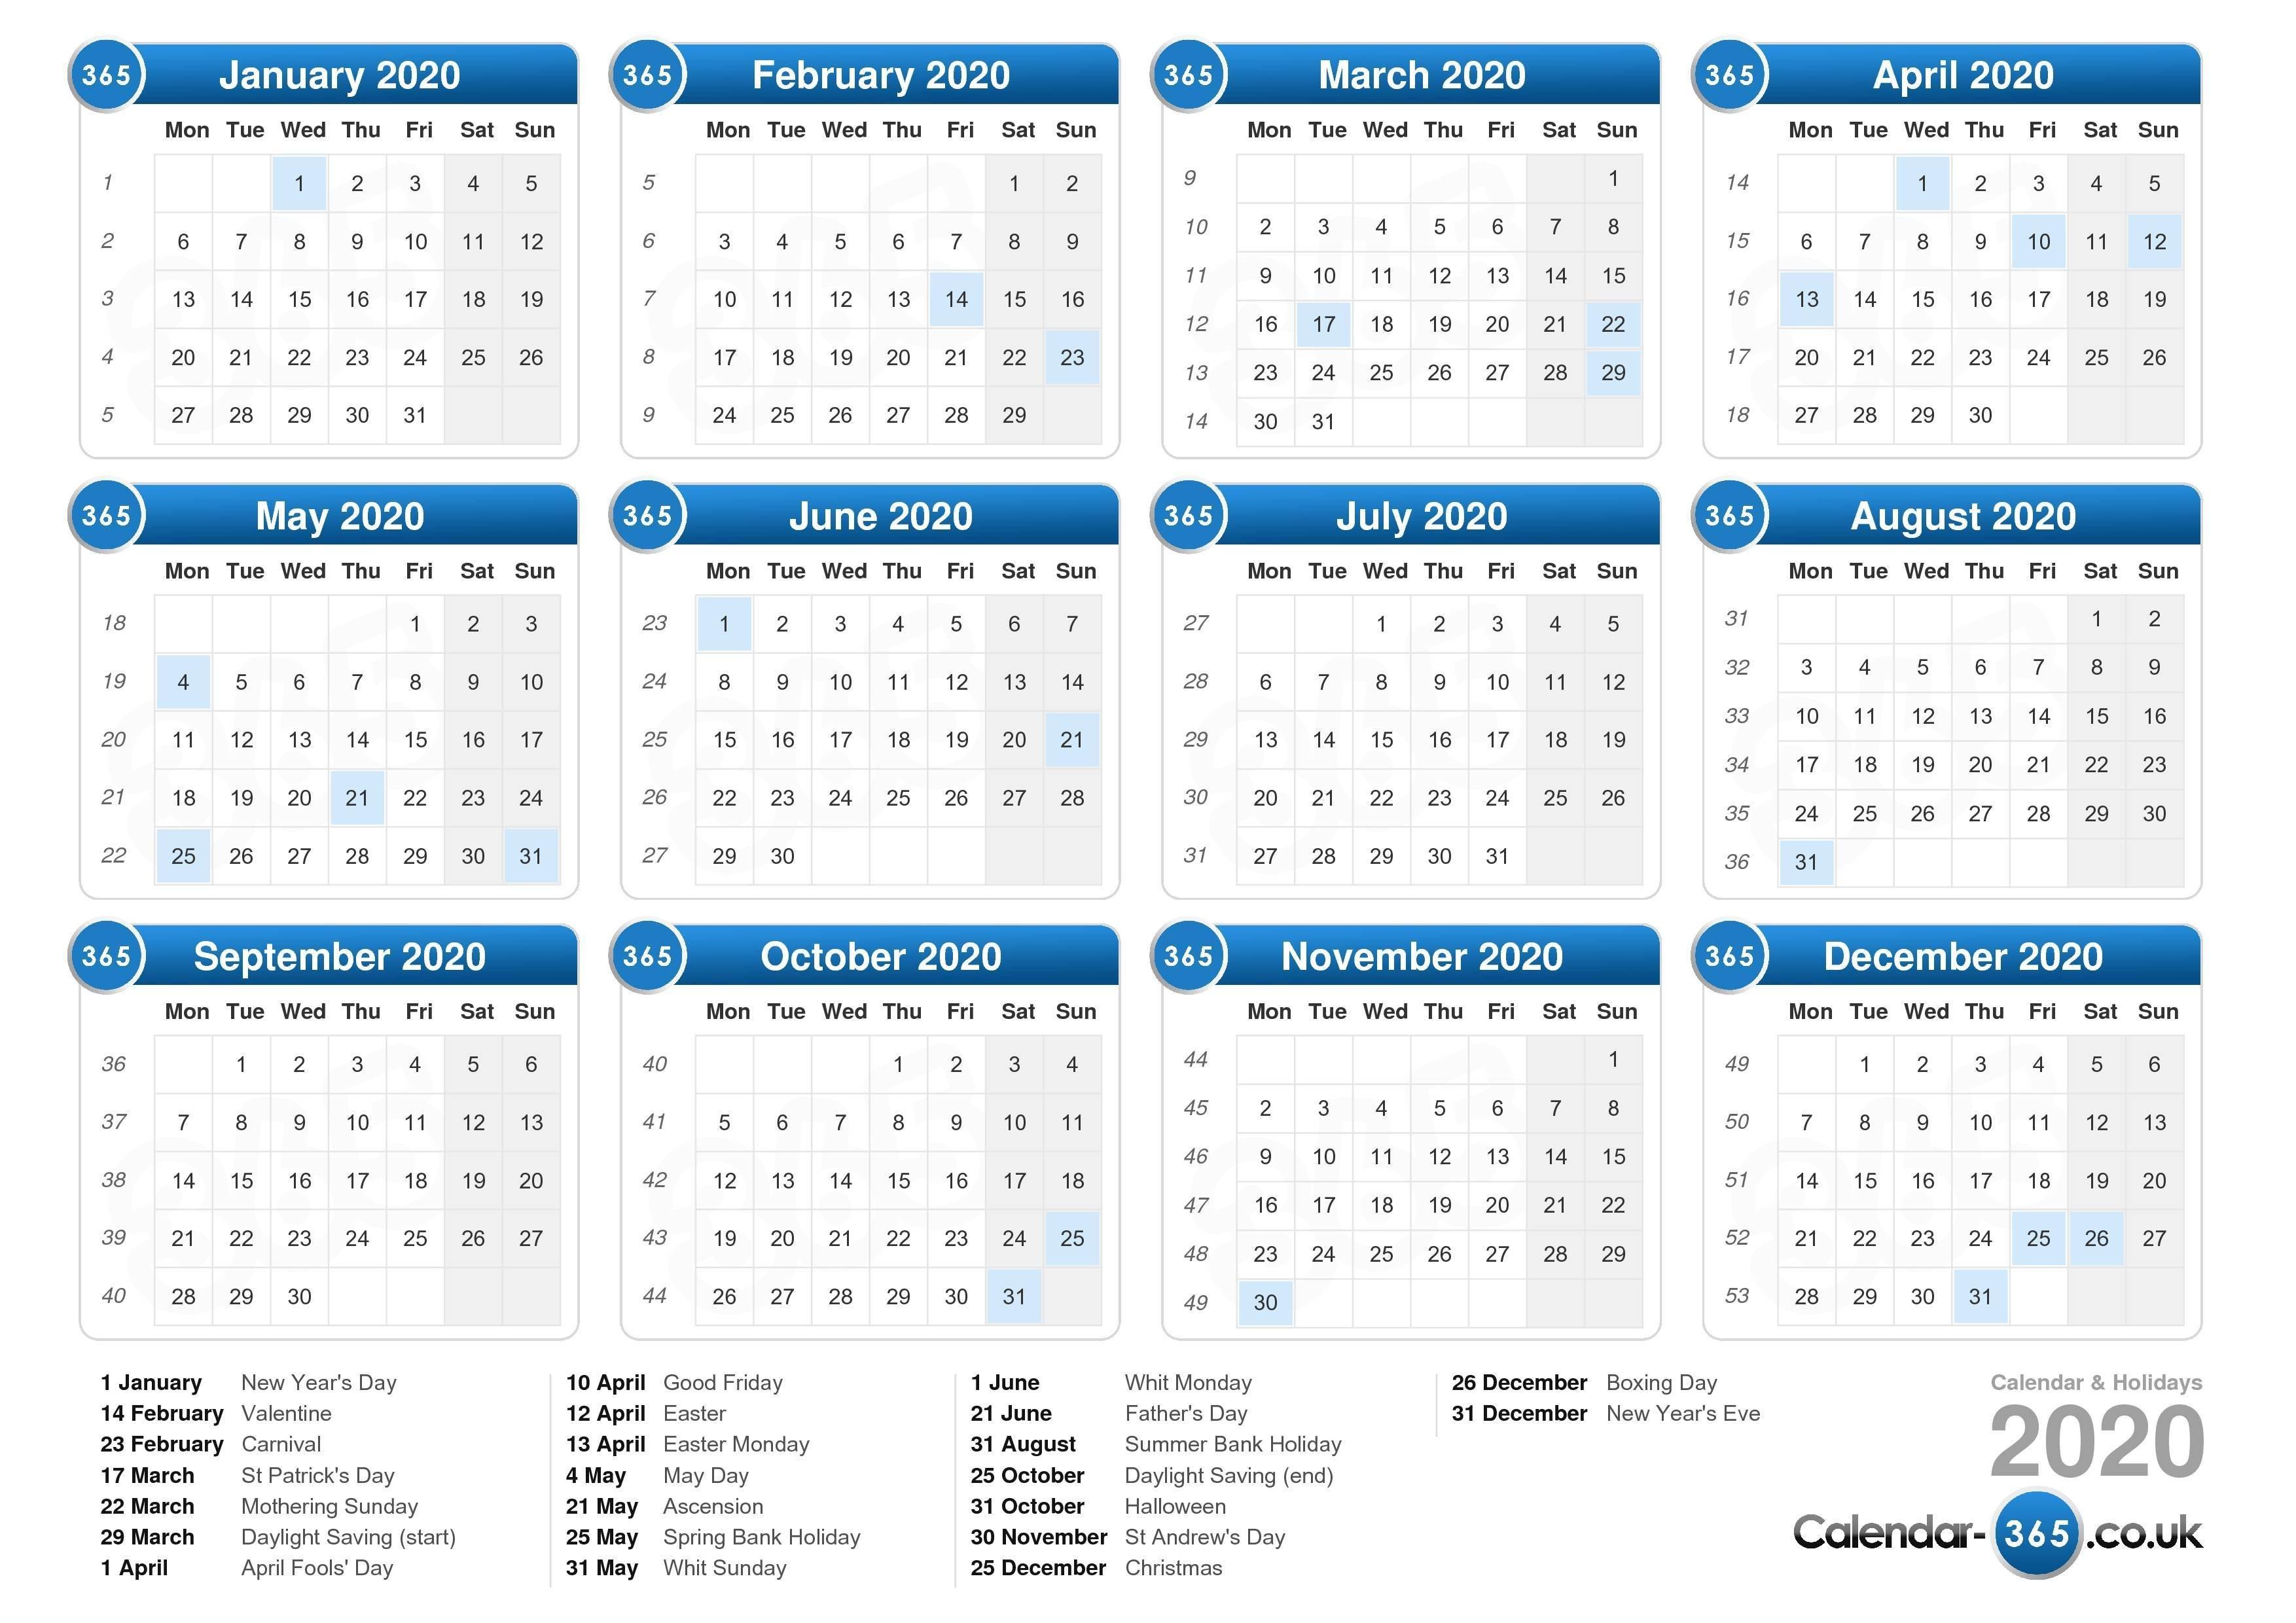 Calendar 2020-Calendar 2020 Printable With Bank Holidays